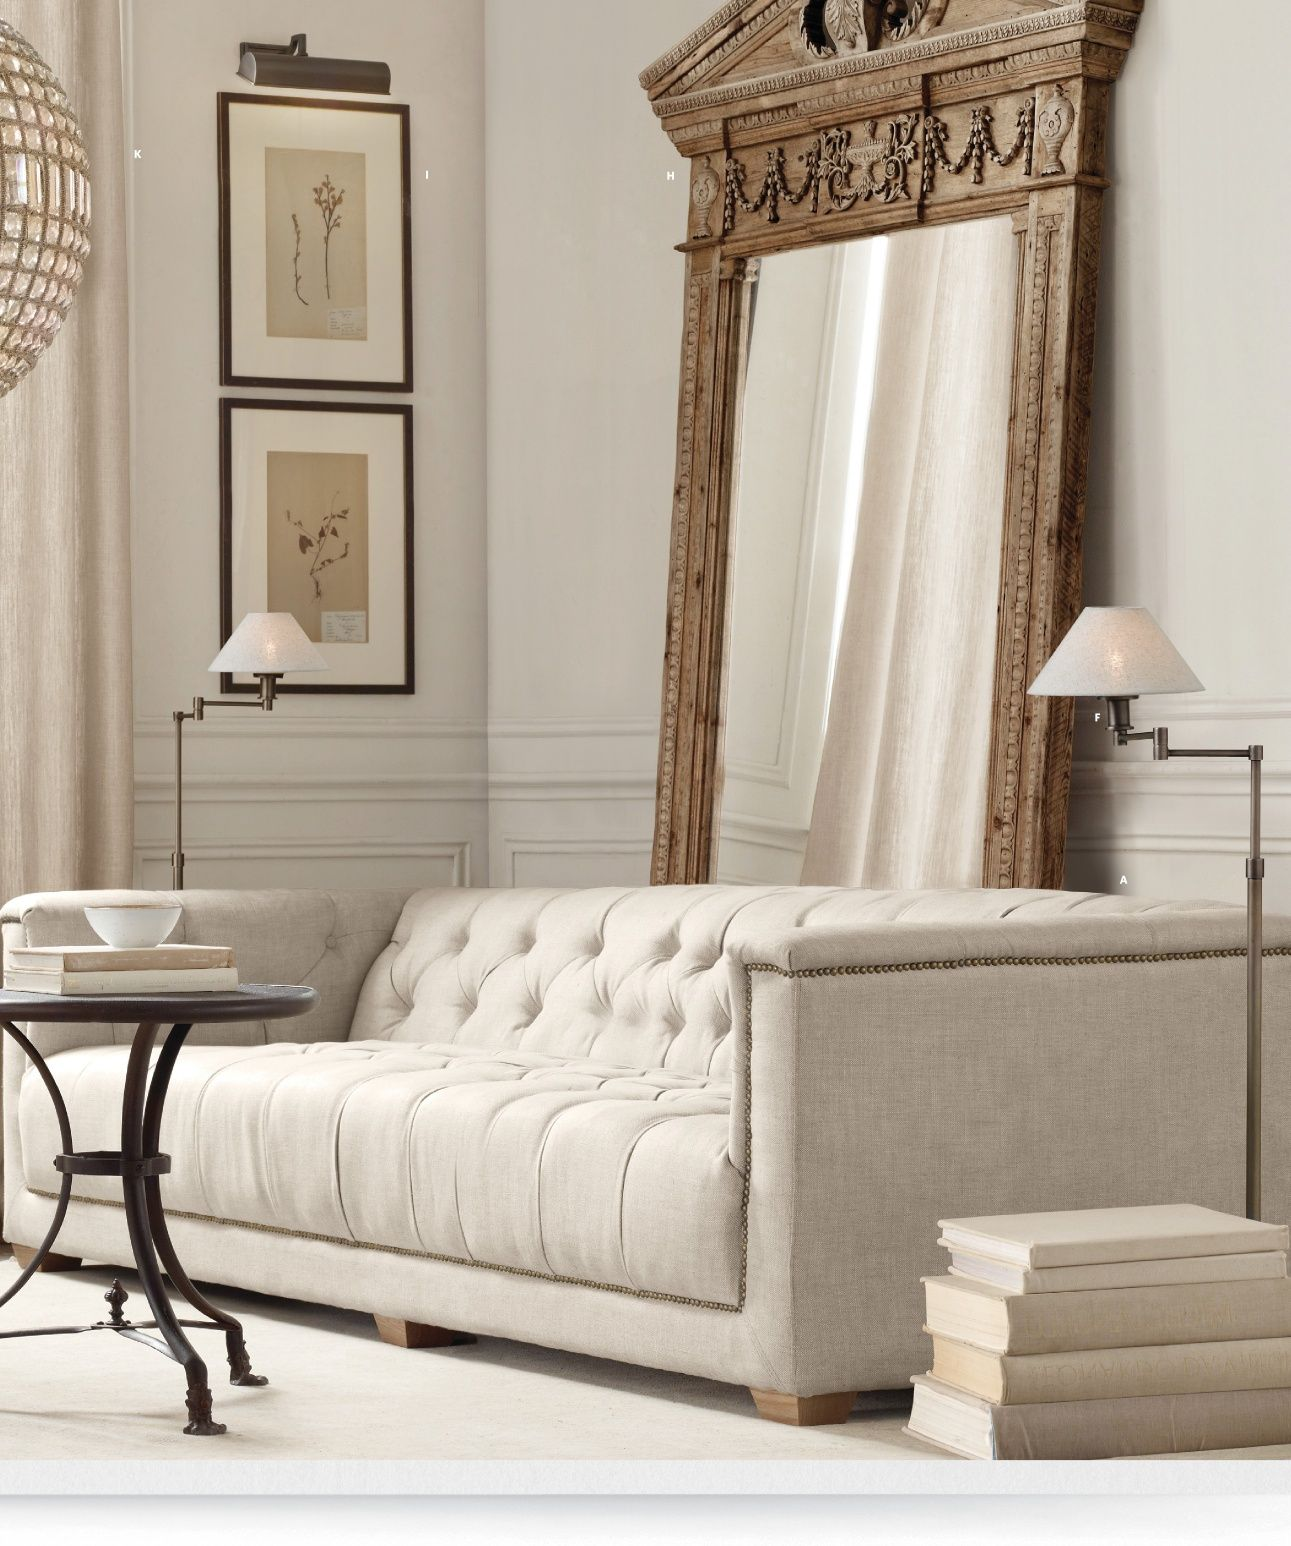 Savoy Upholstered Sofas Restoration hardware